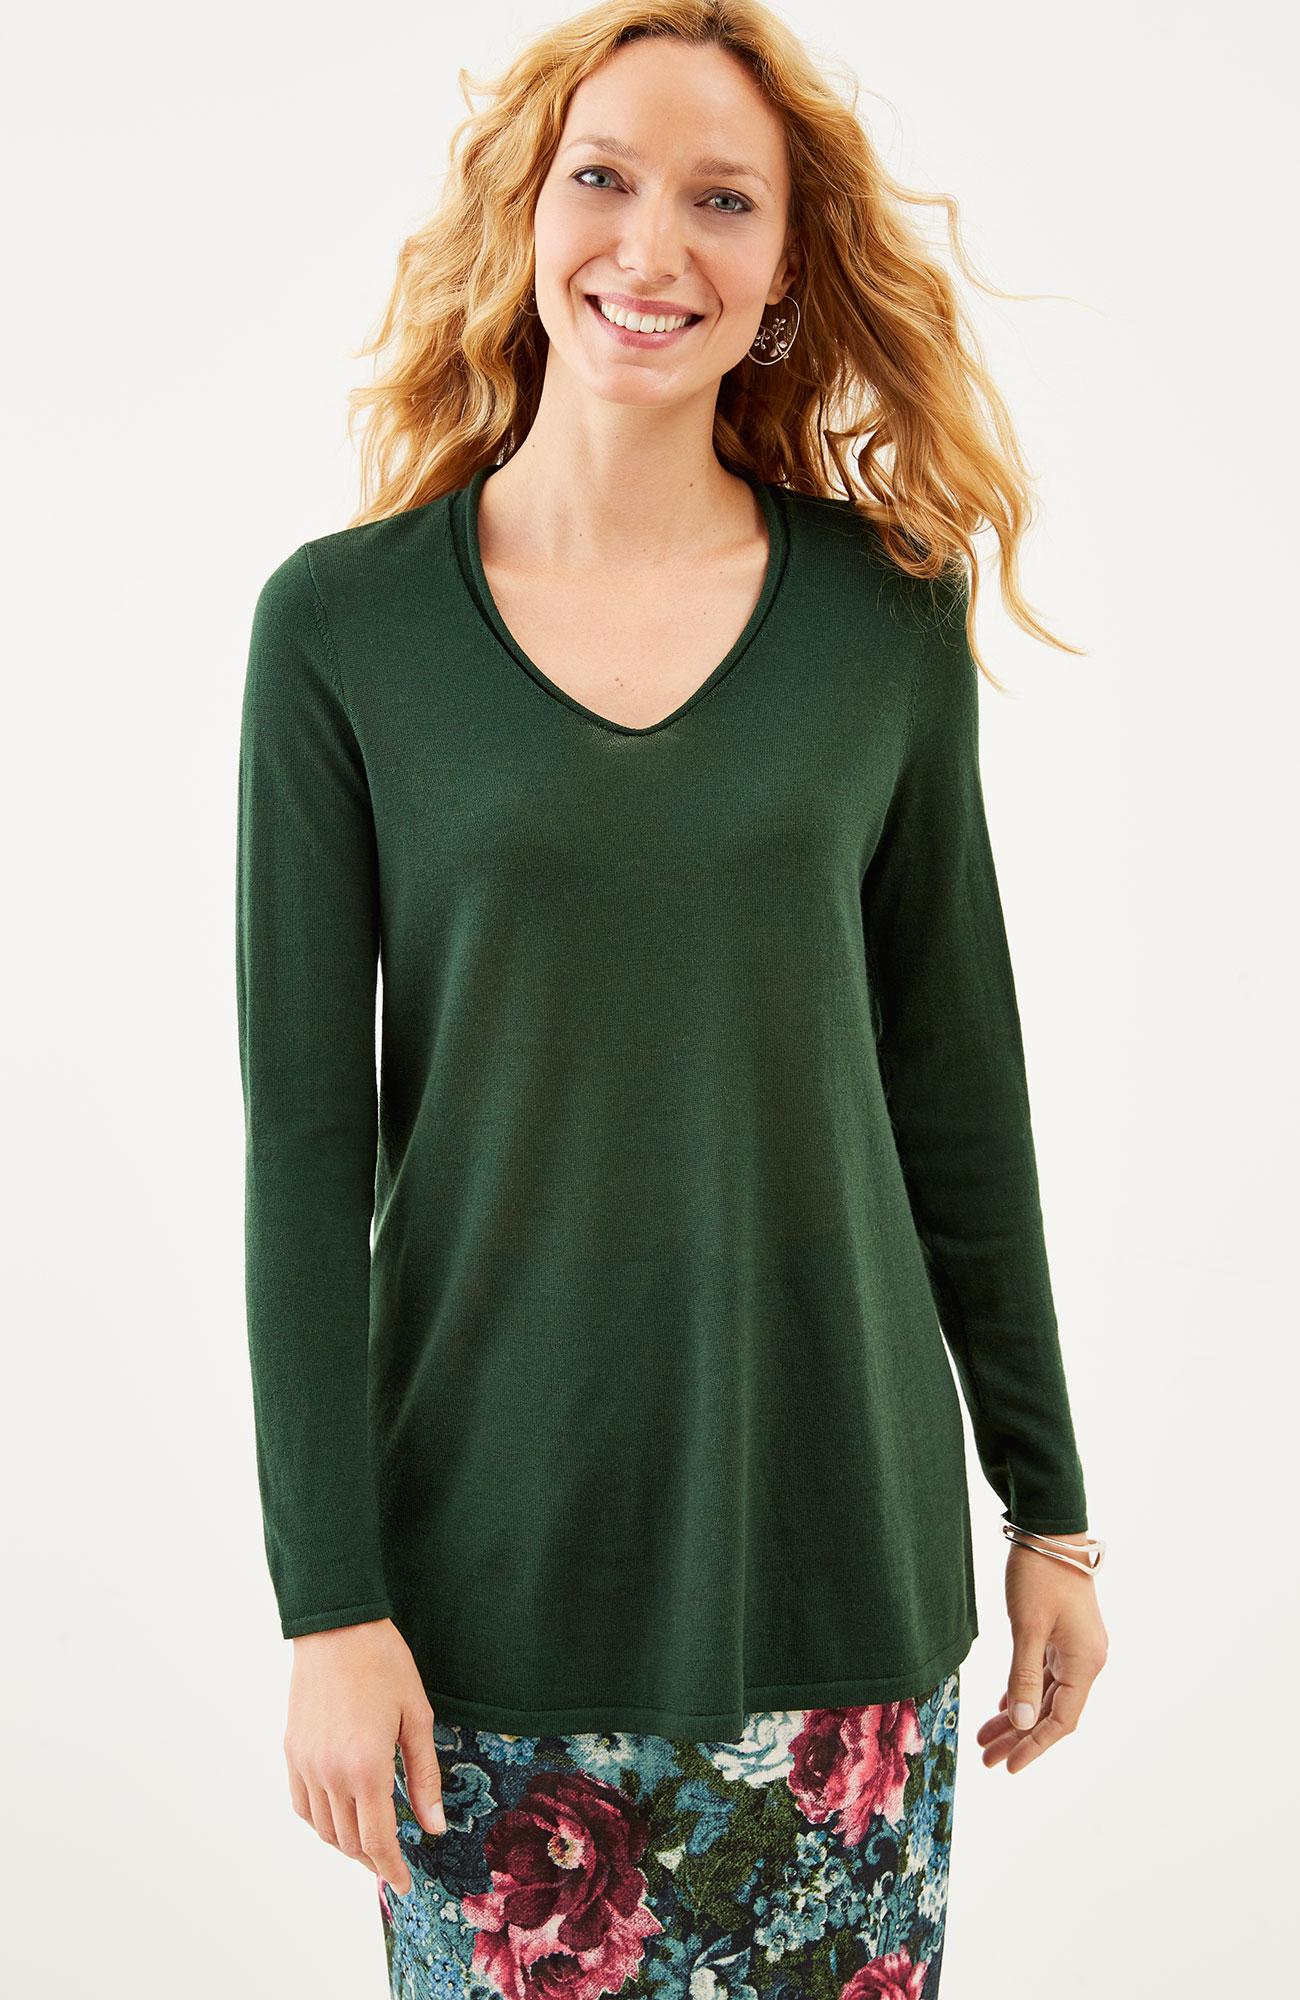 Avery merino pullover